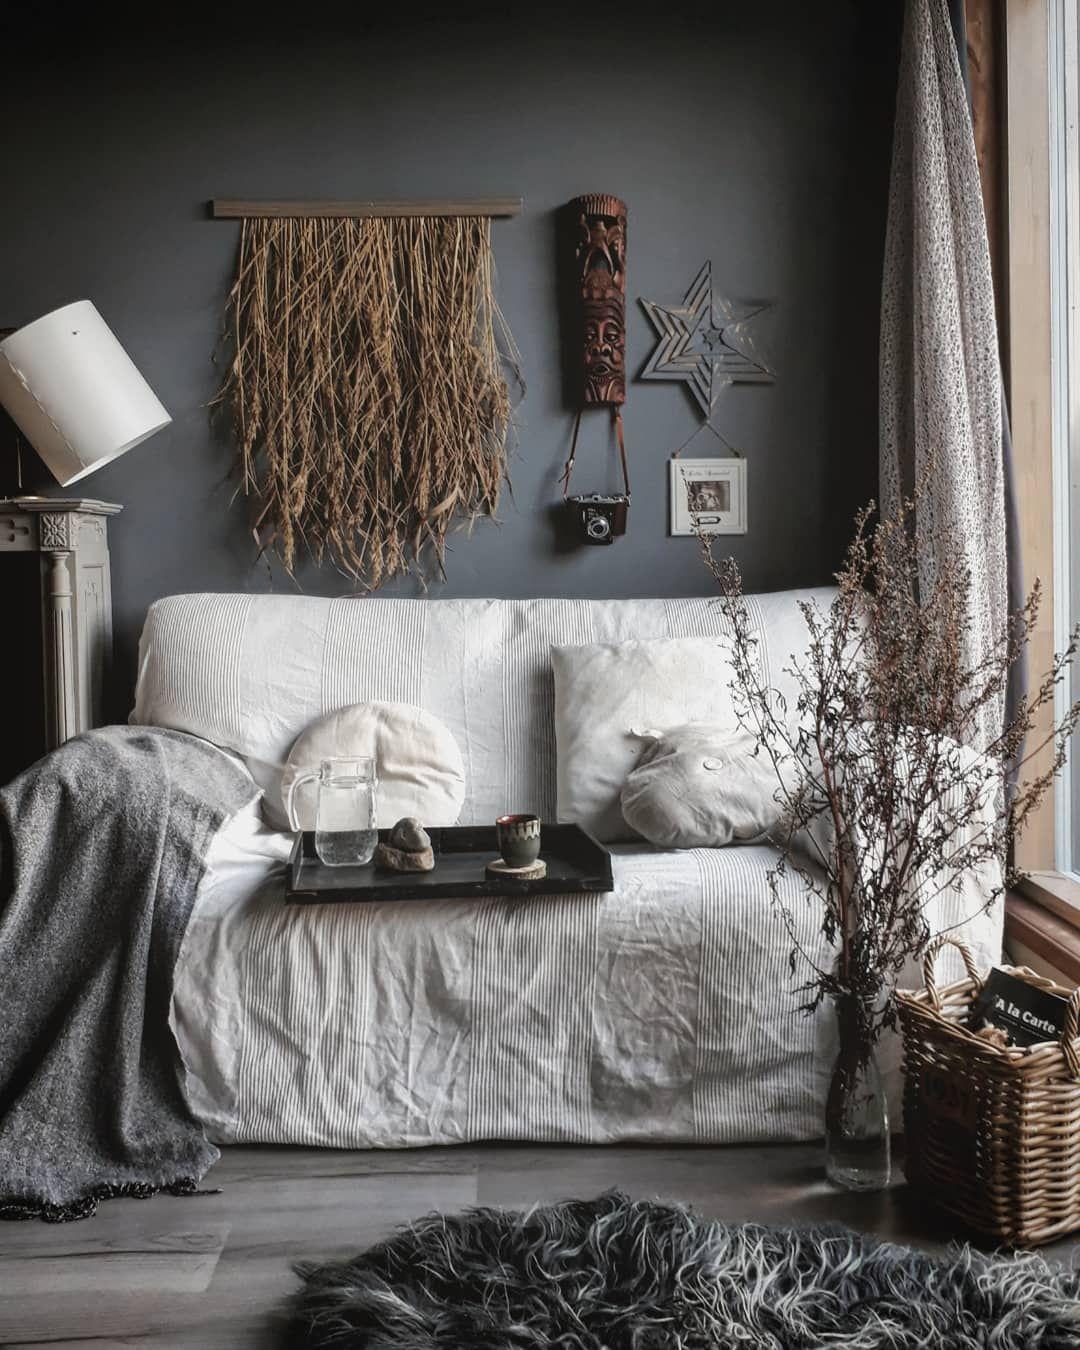 Diy Rustic Boho With Dark Gray Walls By Storm And Clay Gray Bedroom Walls Grey Wall Decor Grey Walls Gray boho bedroom ideas